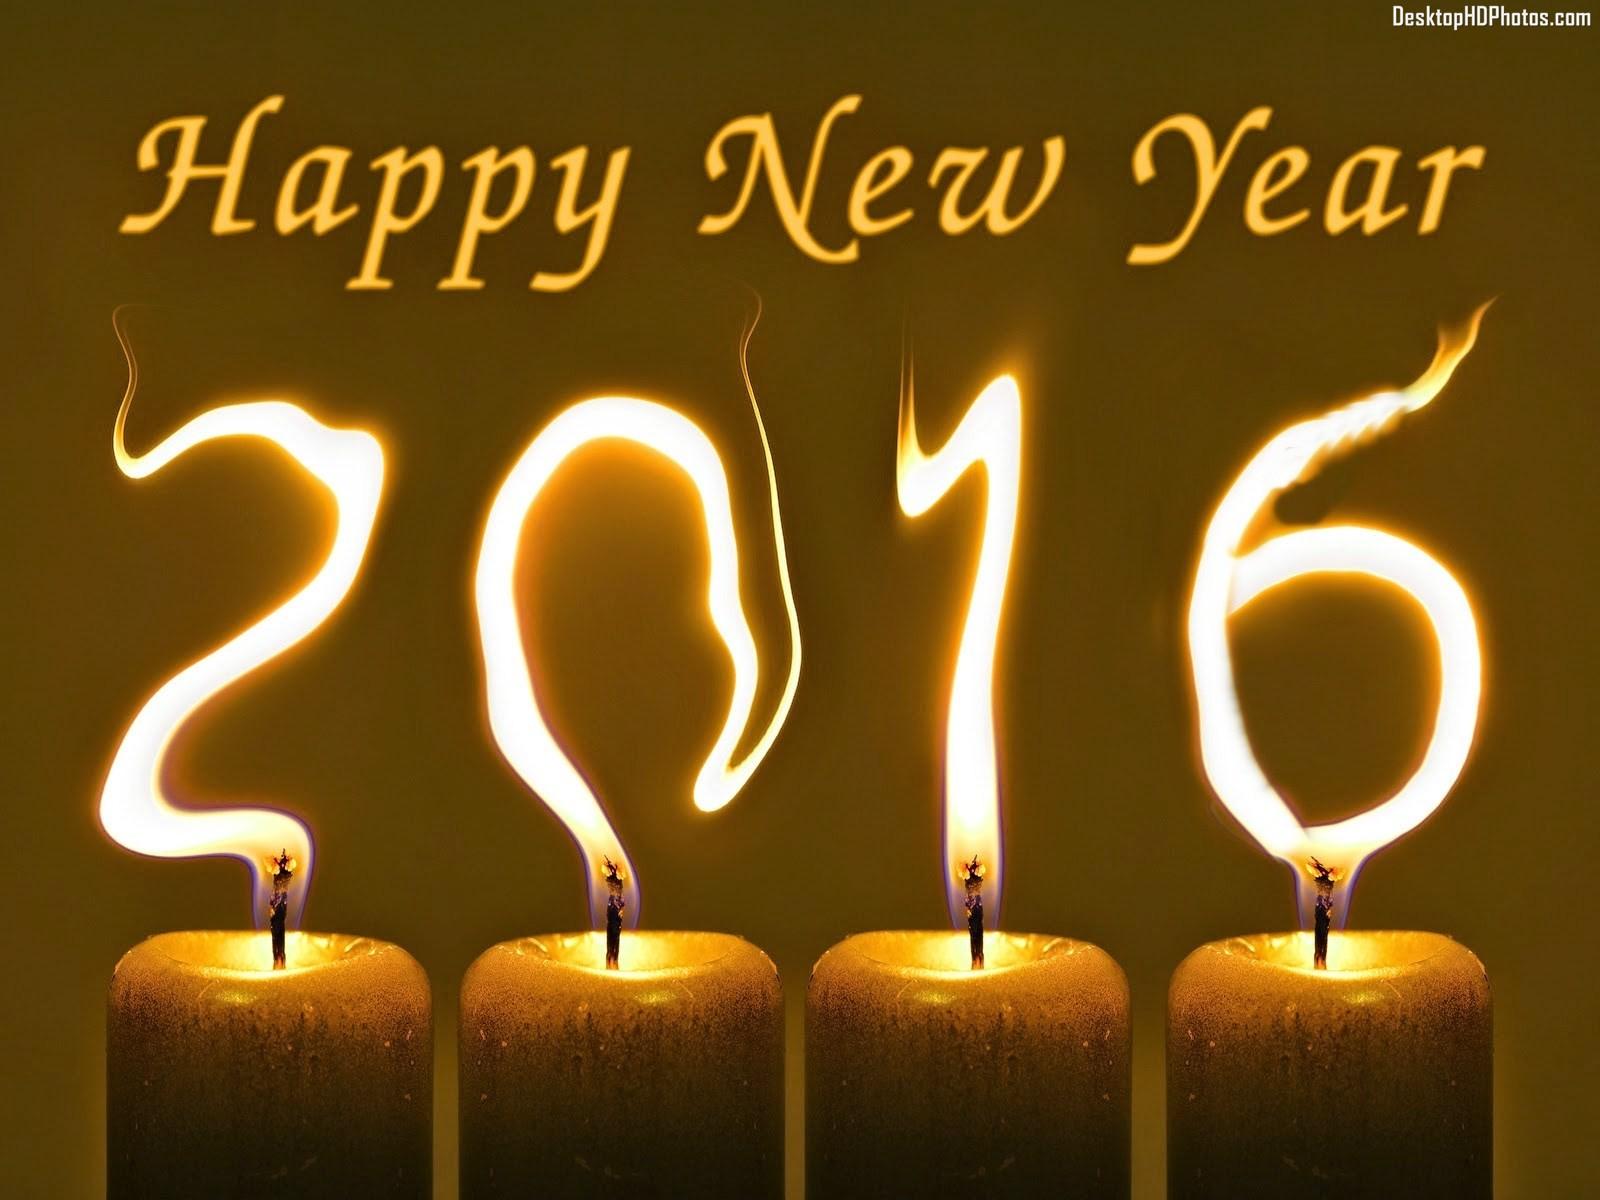 Happy New Year 2016 Wallpaper 3D - Full Version Free Crack | shadag